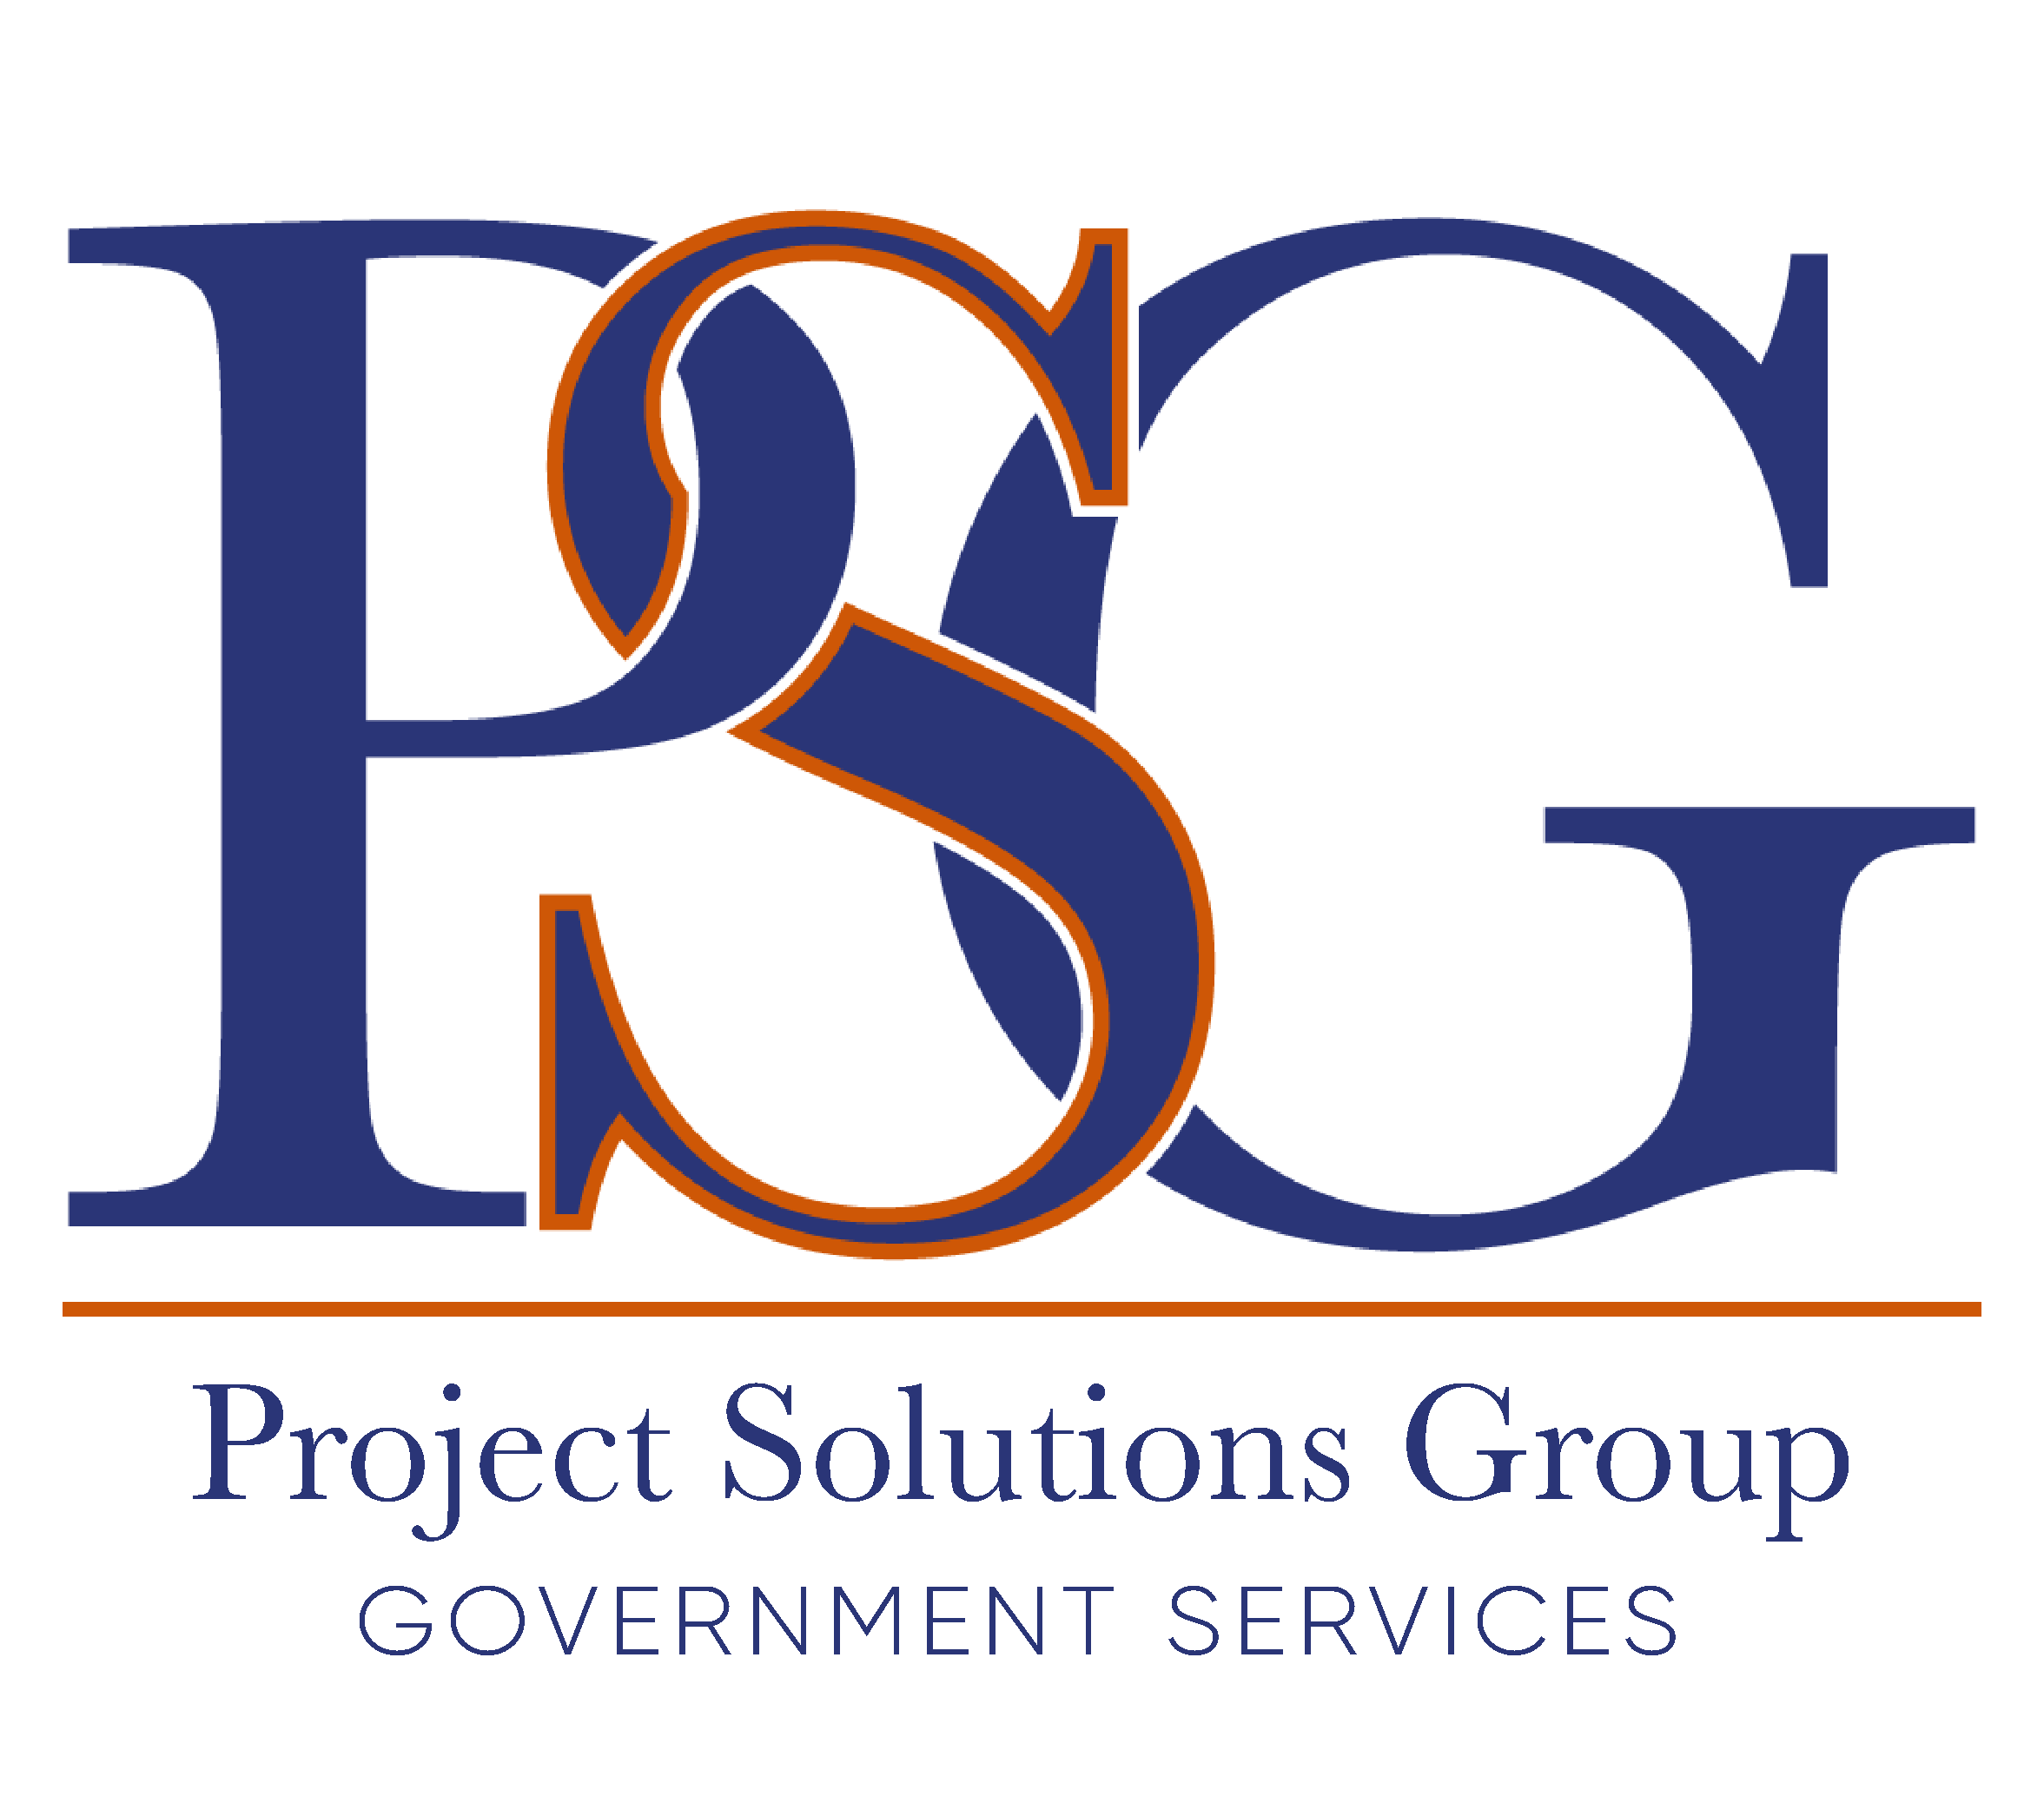 PSG Government